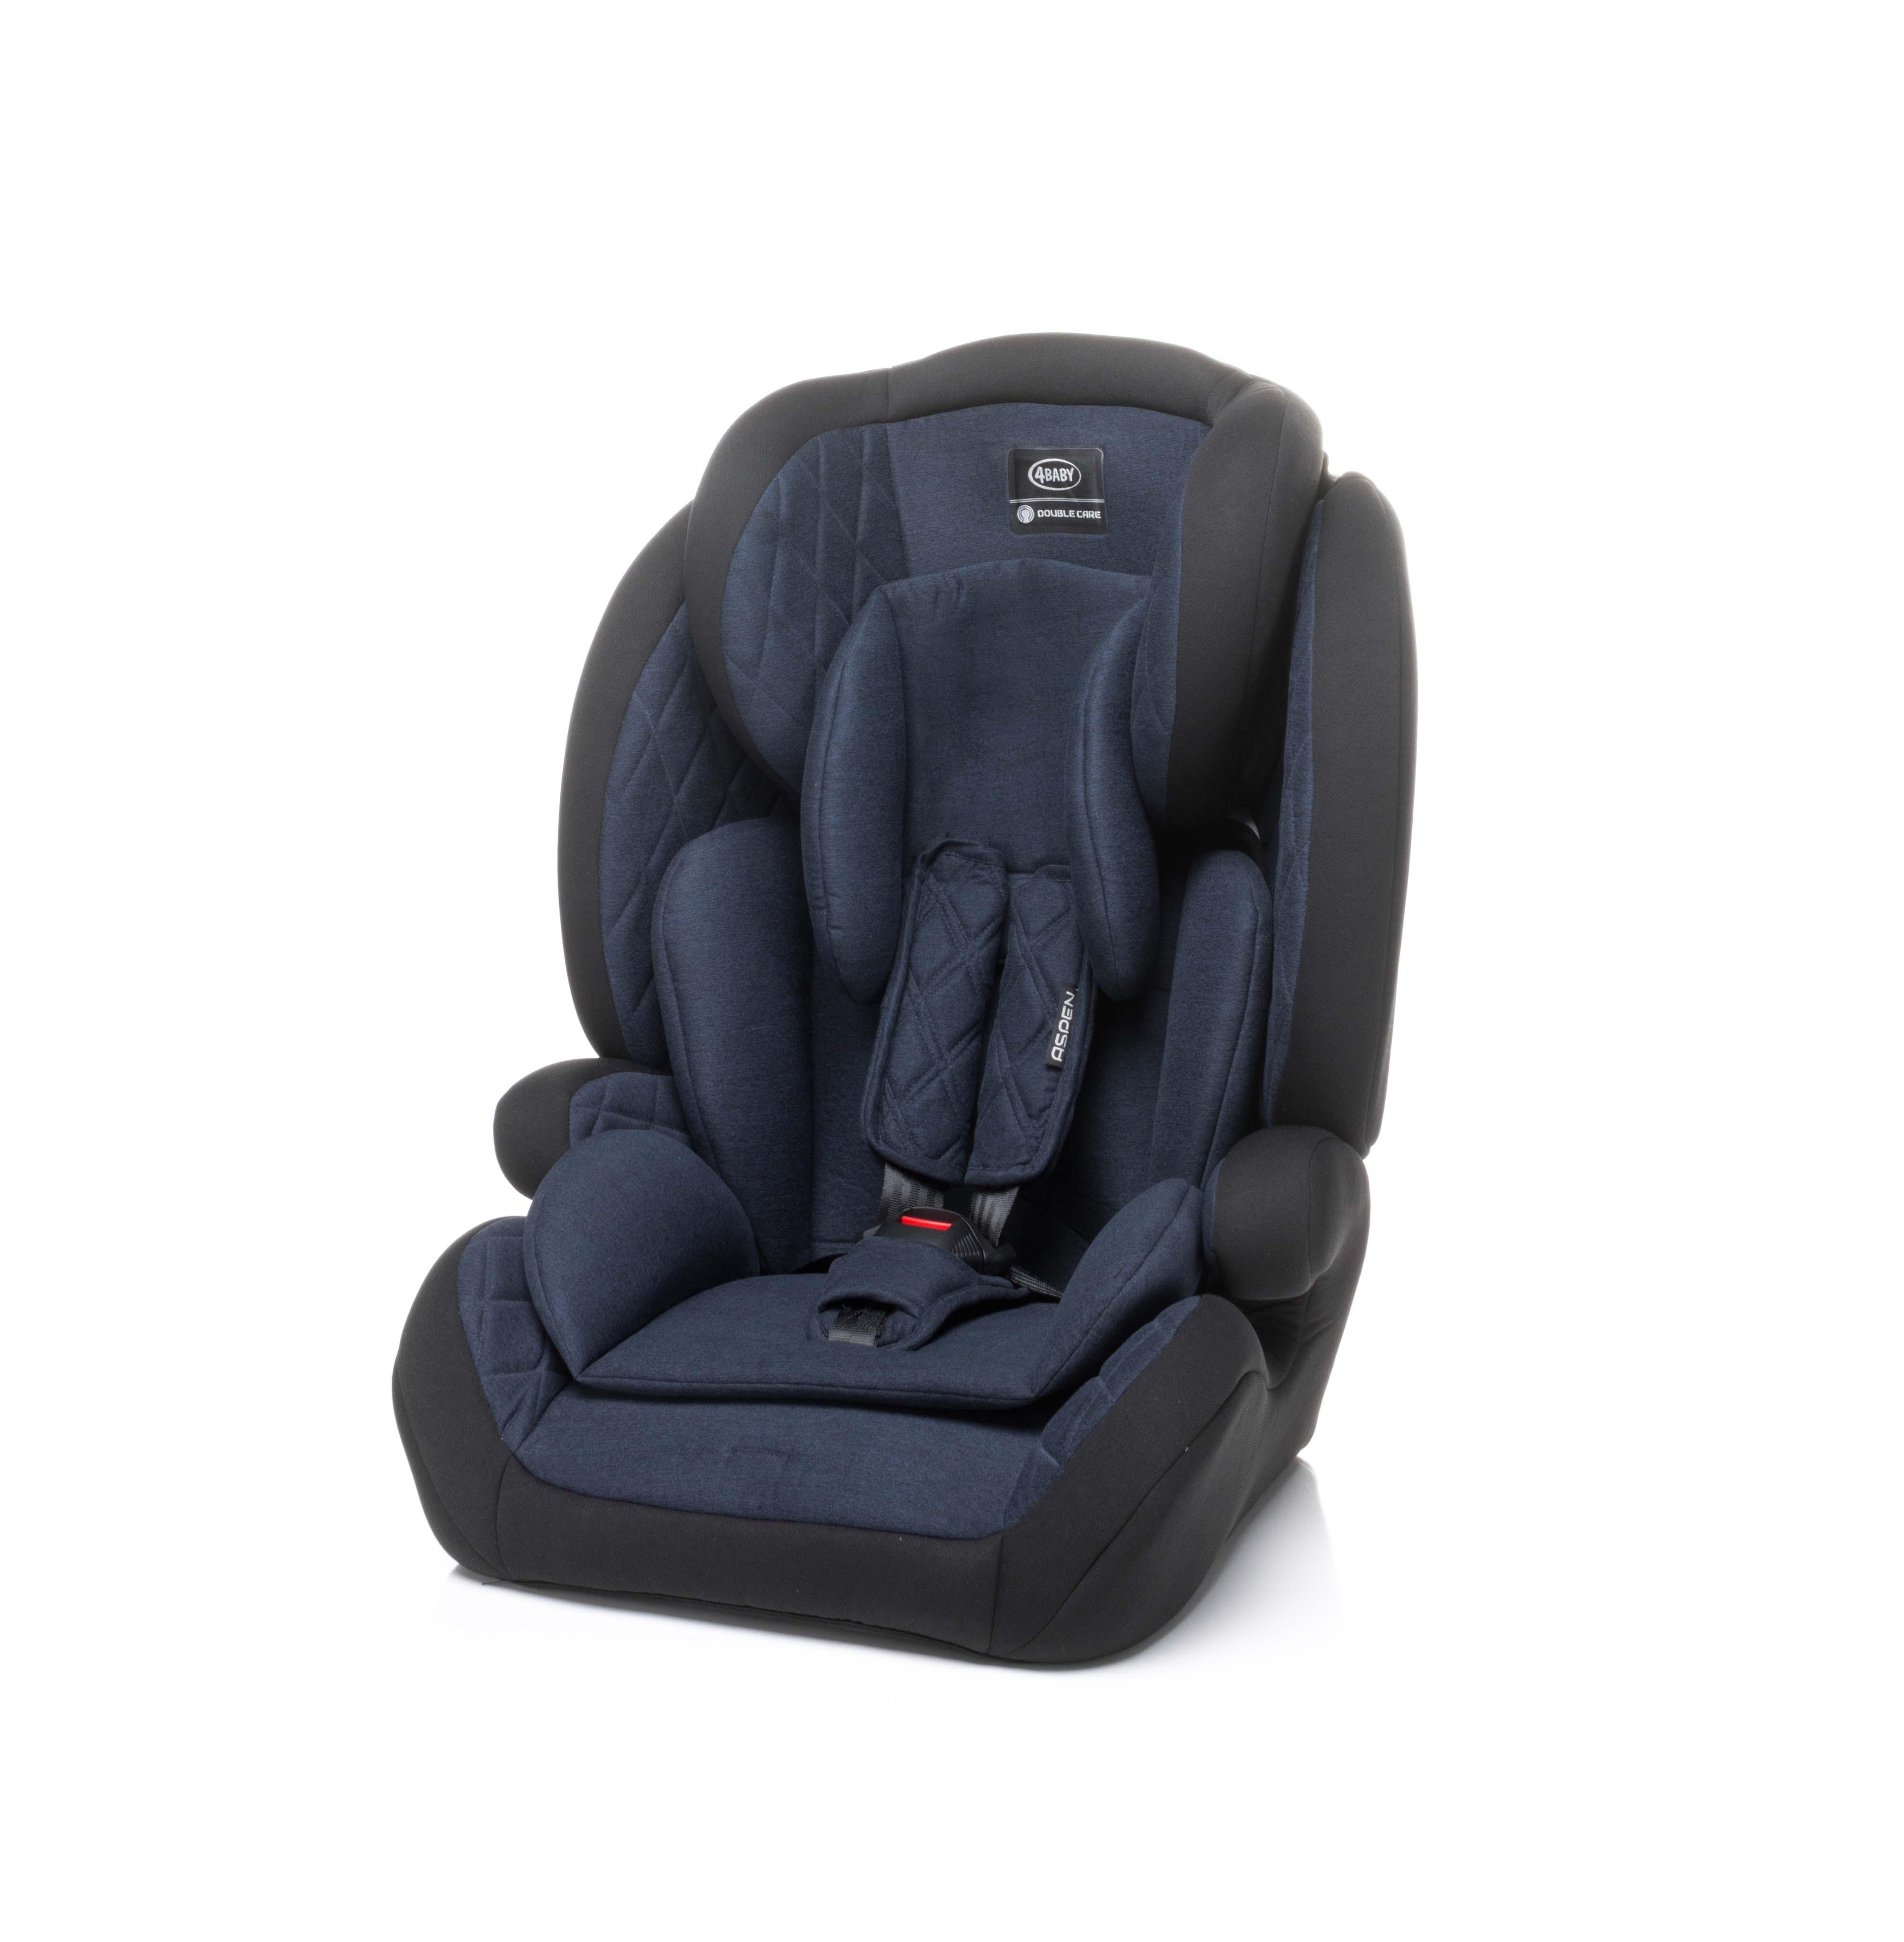 4baby ASPEN navy blue Bērnu autosēdeklis 9-36 kg